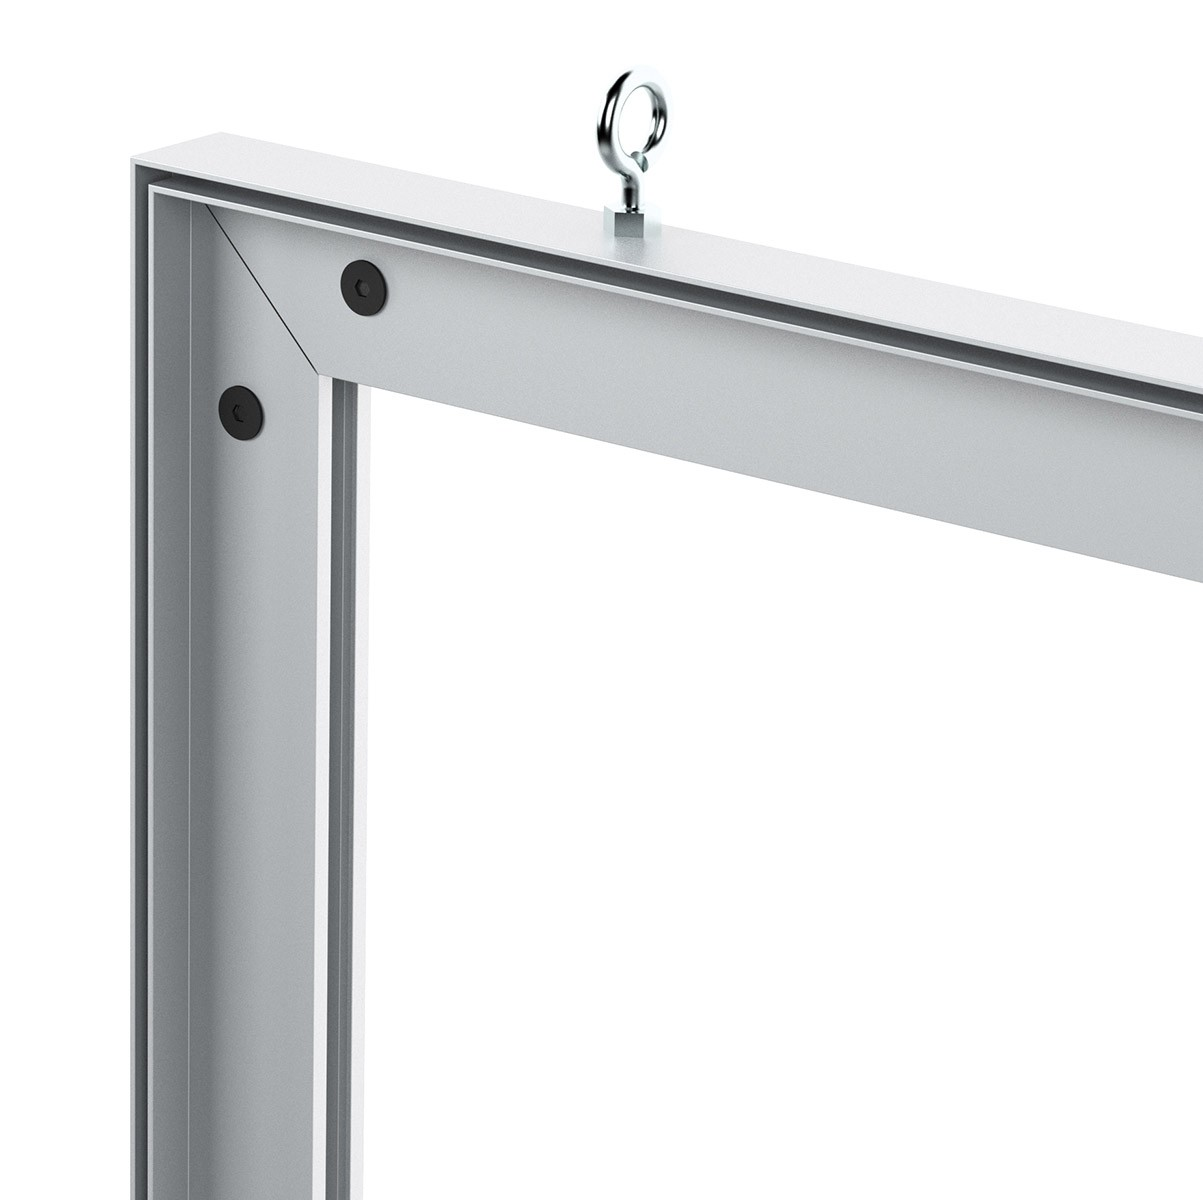 Charisma 60x72 Single Sided SEG Fabric Frame